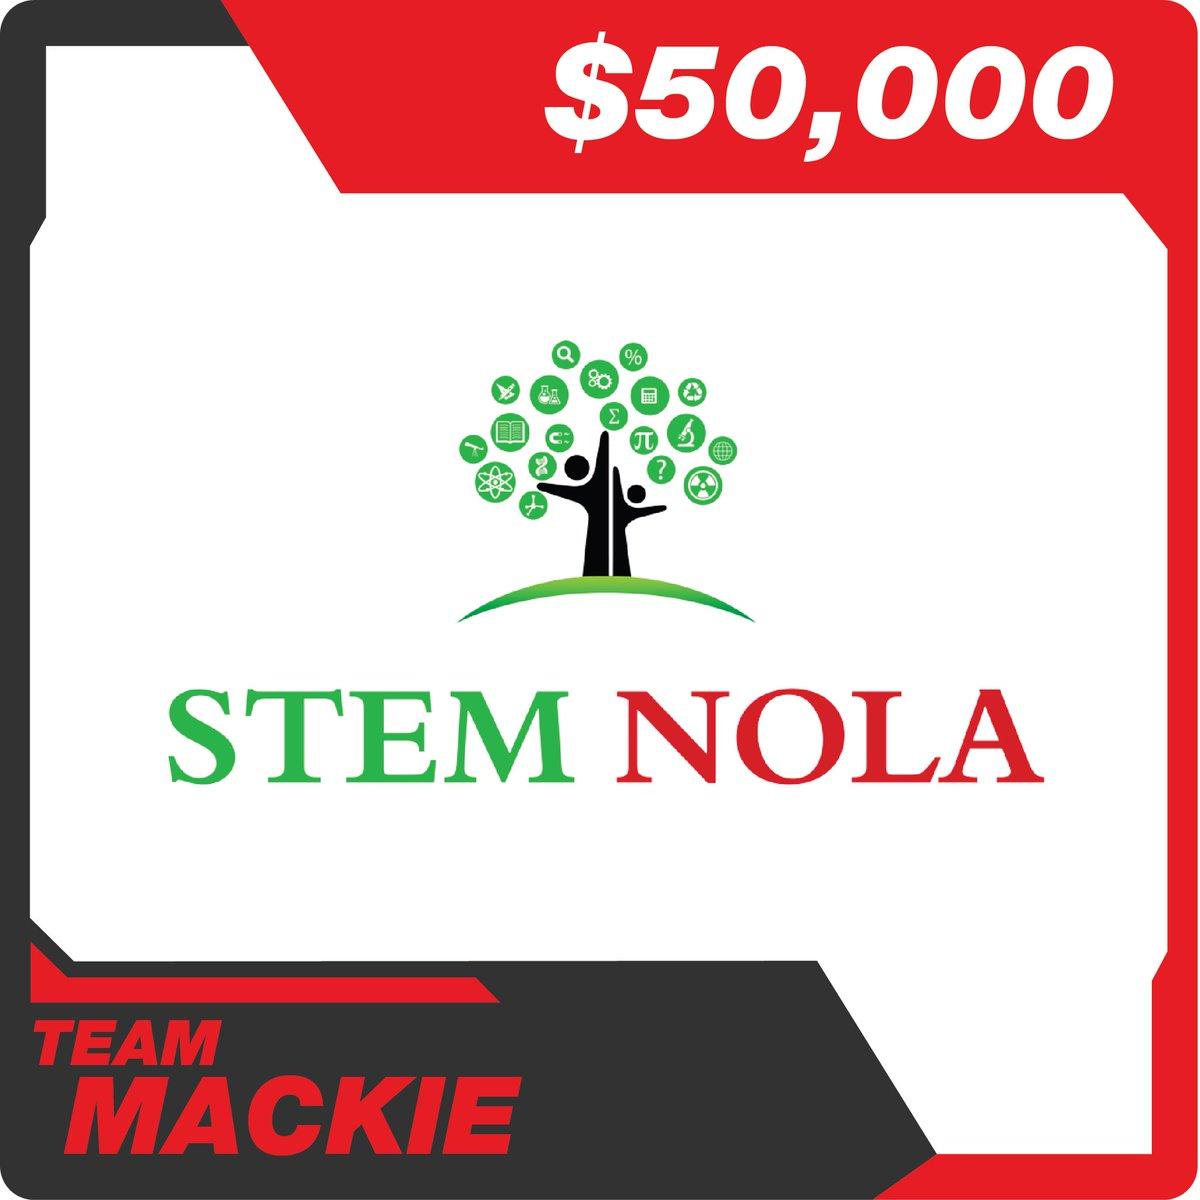 #TeamMackie @AnthonyMackie @STEMNOLA